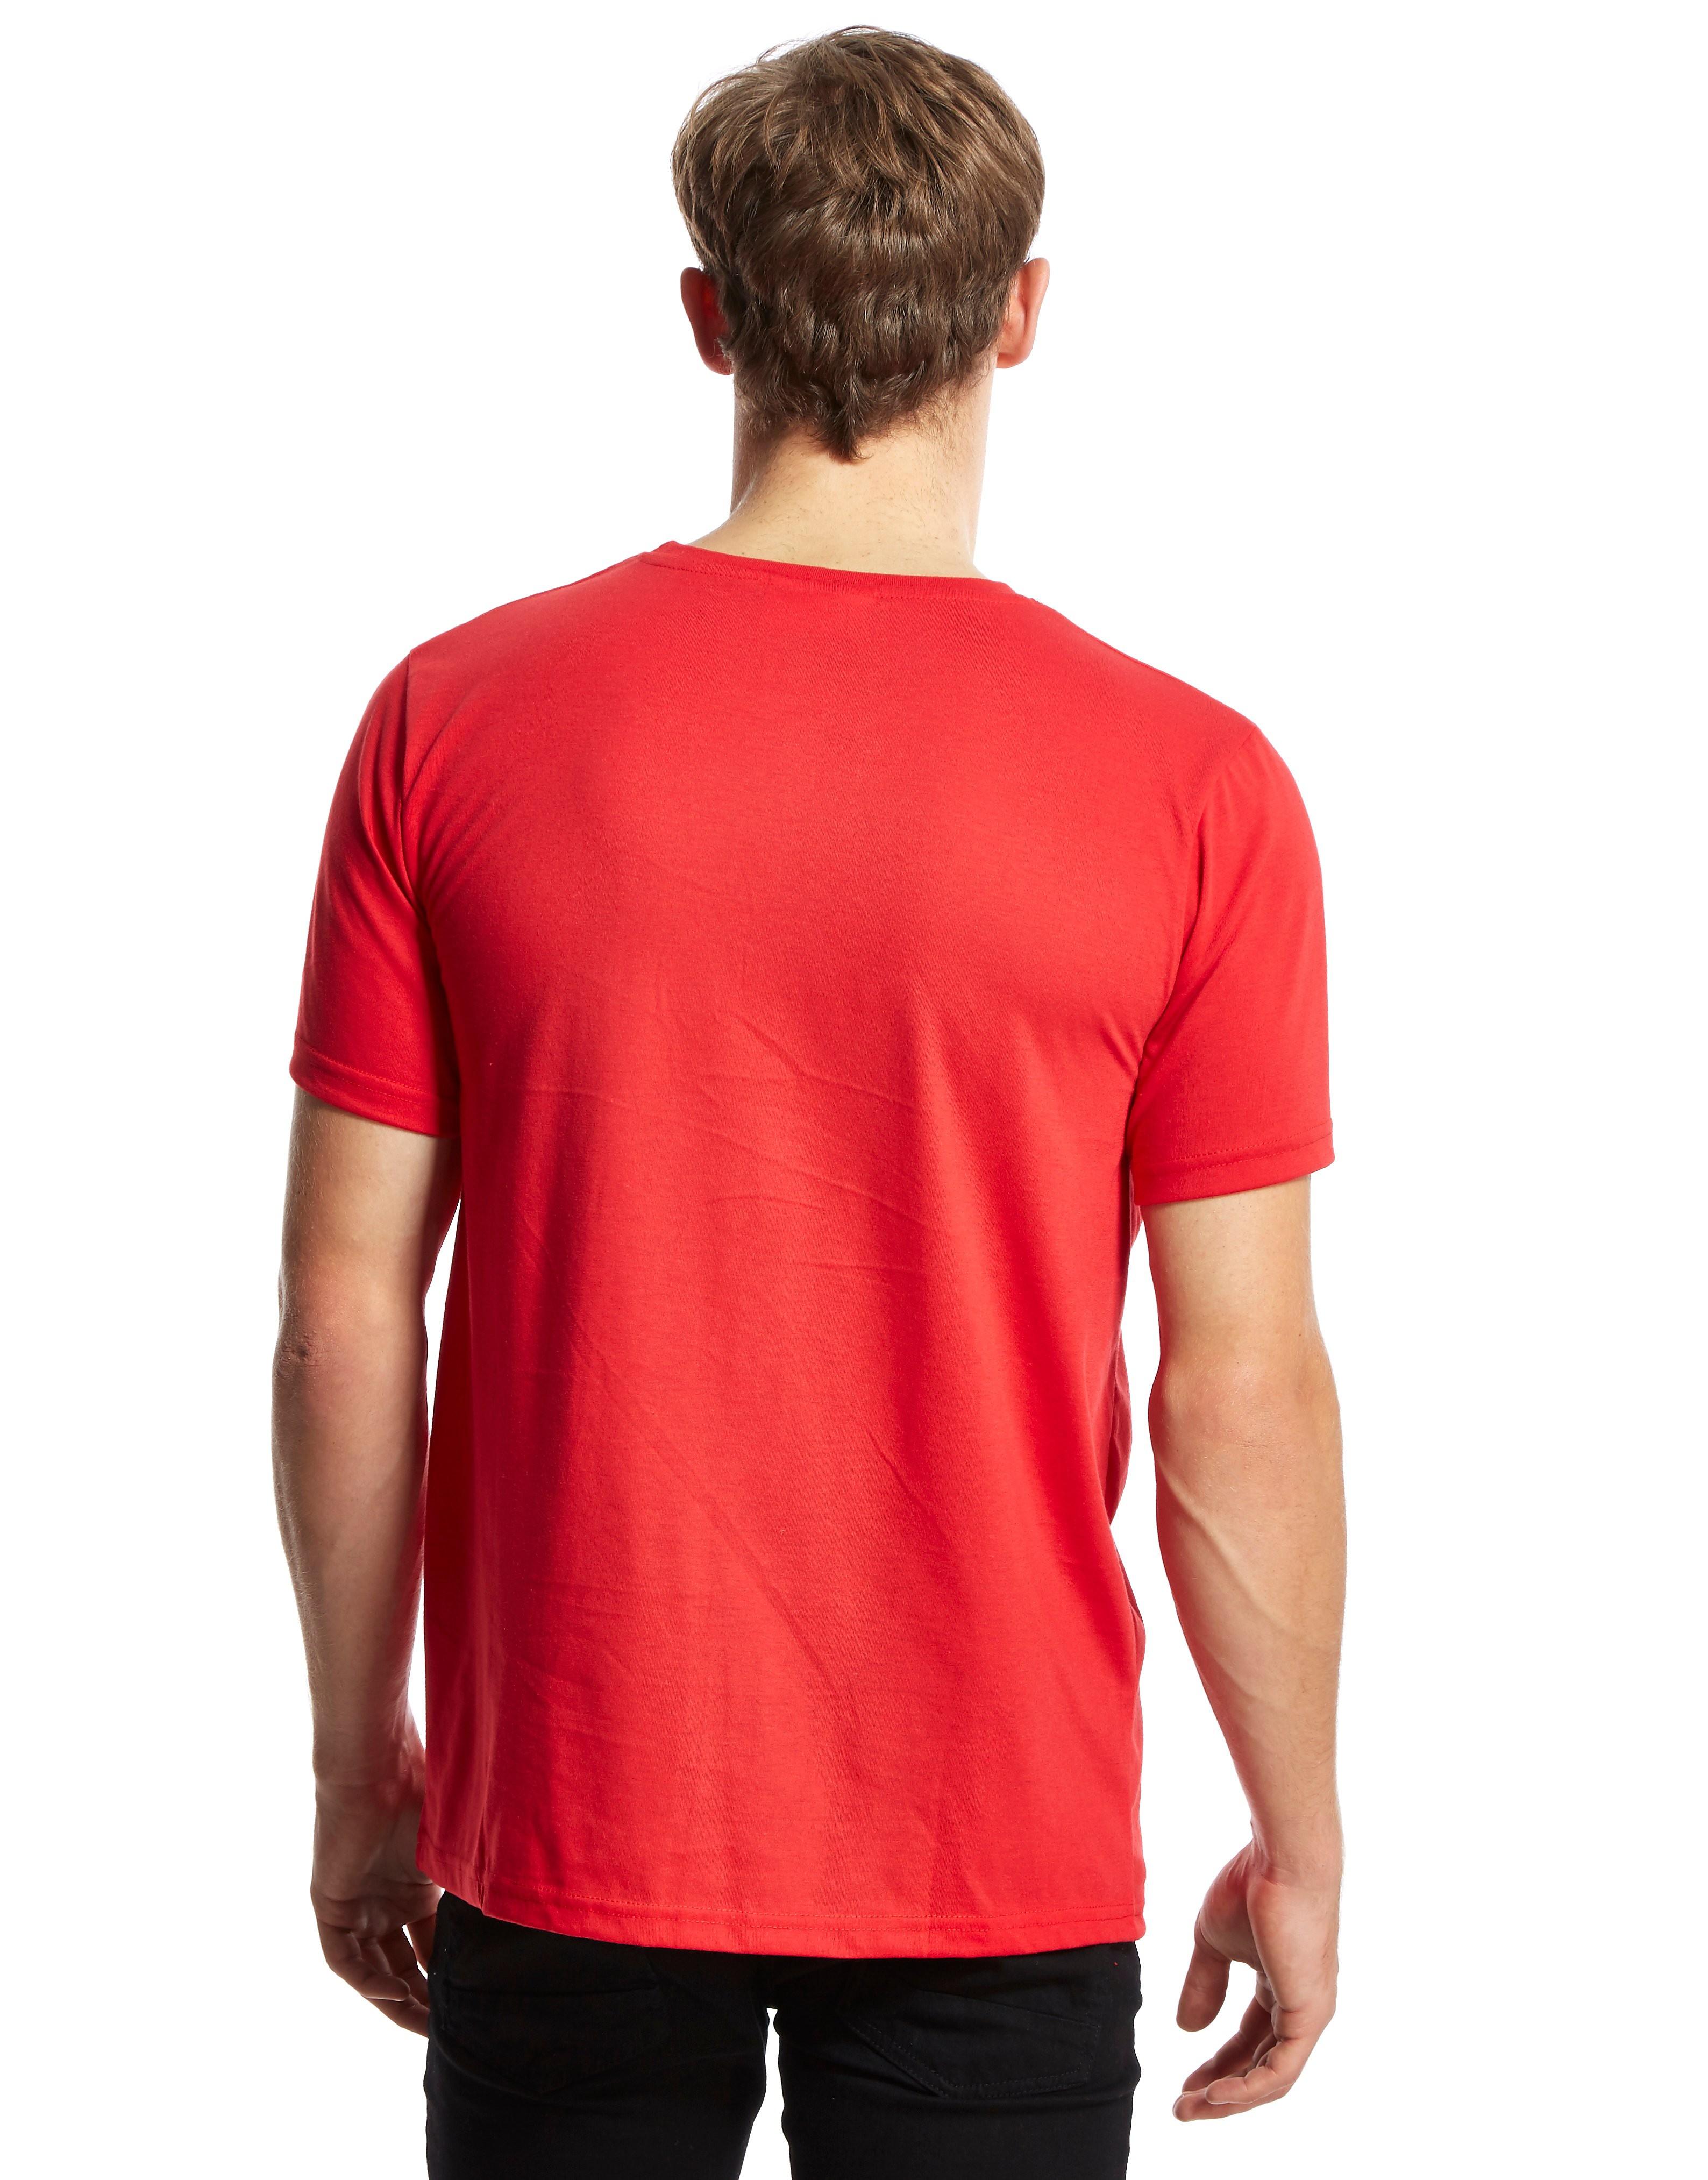 Sergio Tacchini Hollyburn T-Shirt